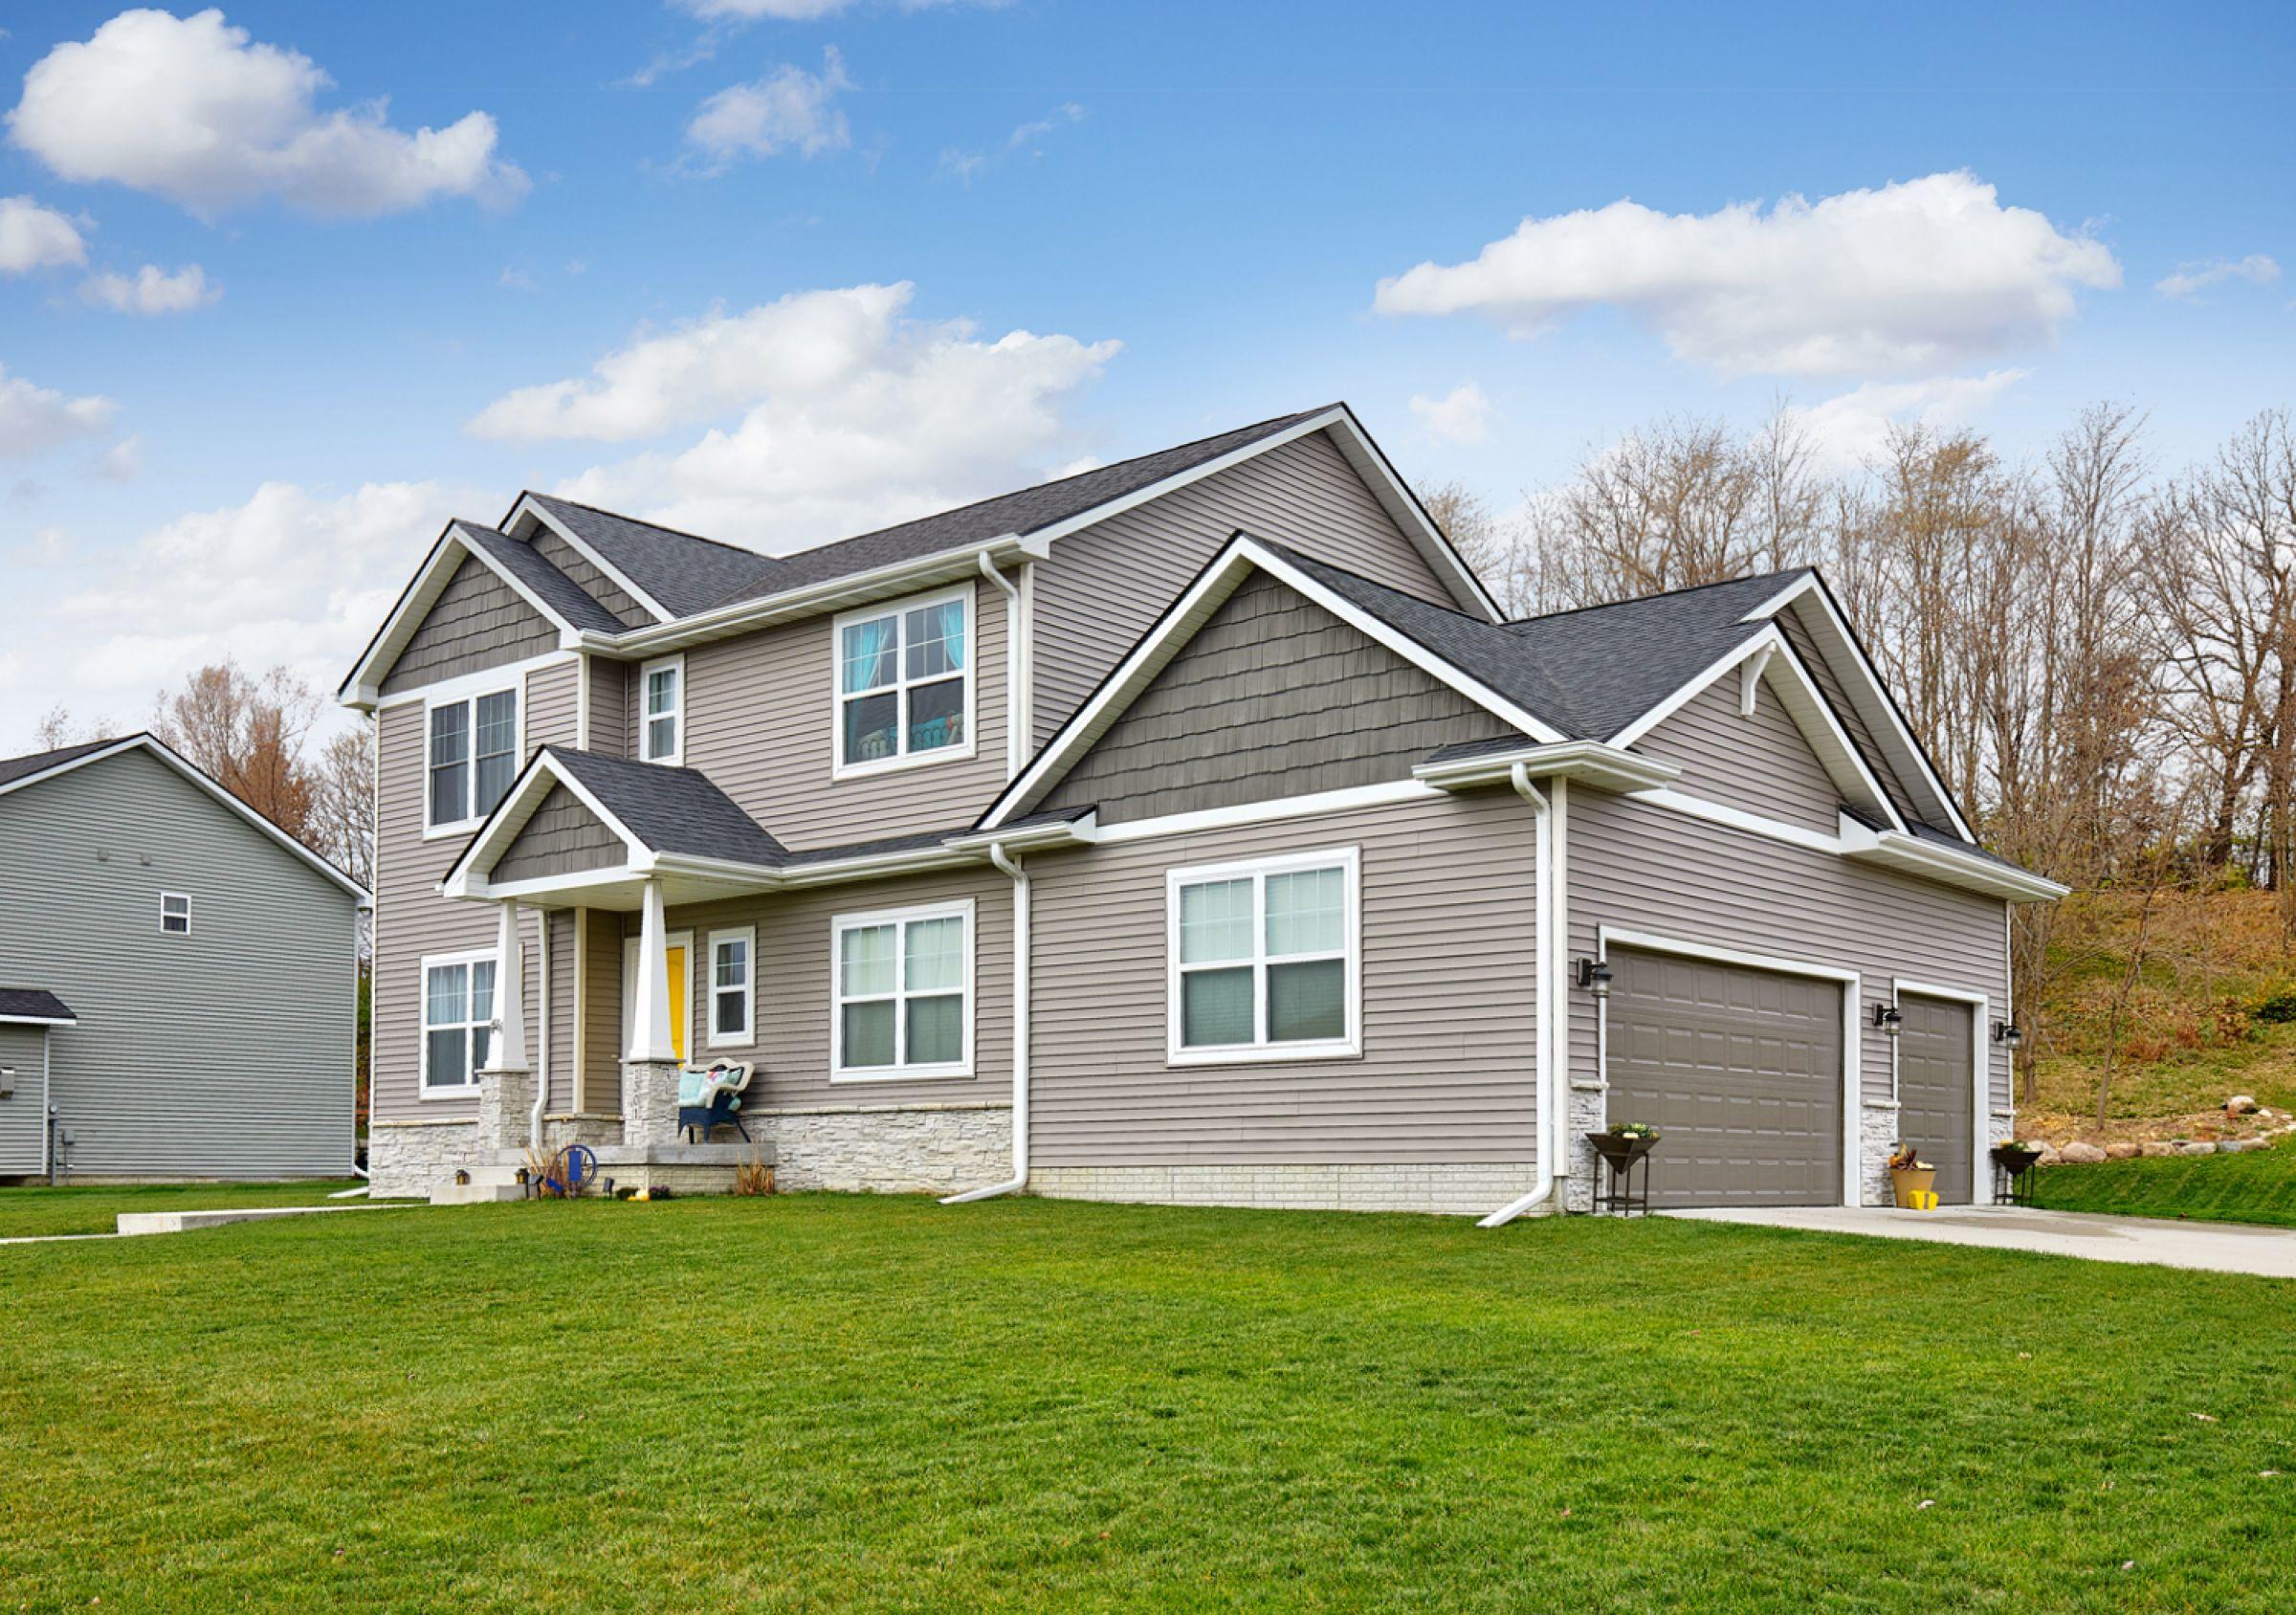 residential-warren-county-iowa-1-acres-listing-number-15254-1-2020-11-11-165759.jpg